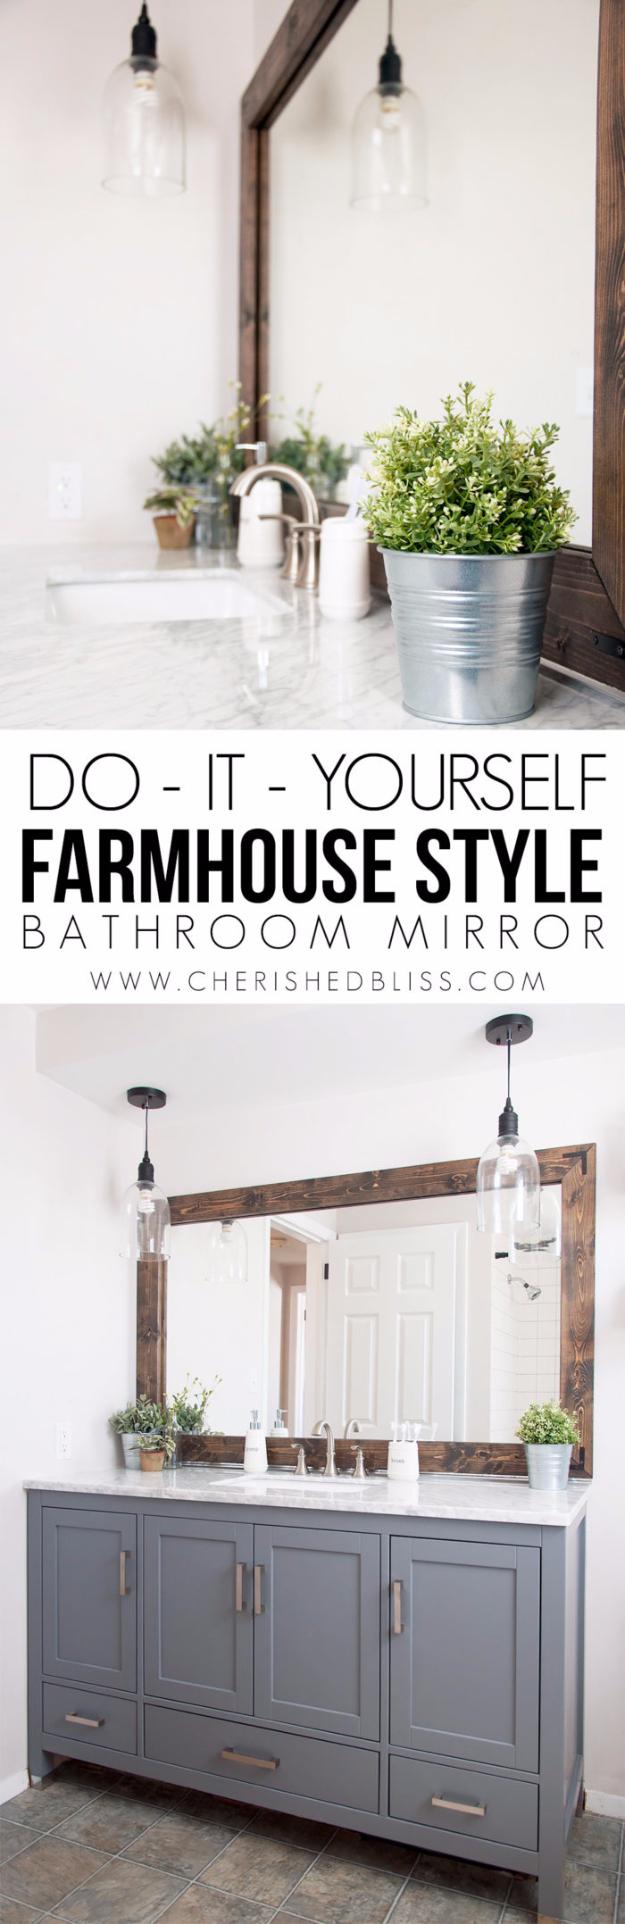 41 More DIY Farmhouse Style Decor Ideas - Farmhouse Bathroom Mirror Tutorial - Creative Rustic Ideas for Cool Furniture, Paint Colors, Farm House Decoration for Living Room, Kitchen and Bedroom http://diyjoy.com/diy-farmhouse-decor-projects